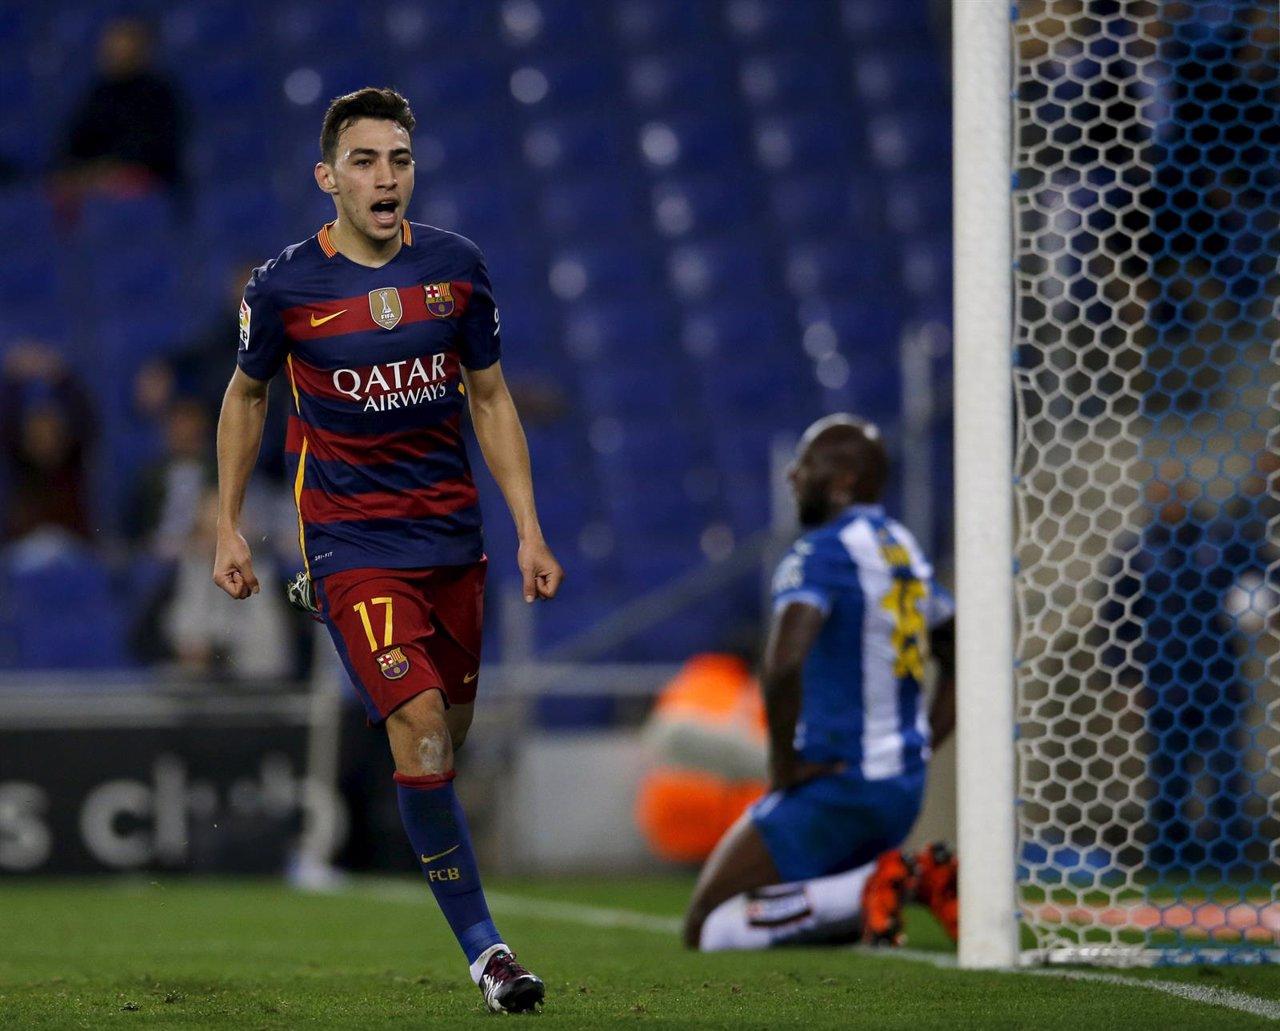 Munir resuelve el derbi ante el Espanyol